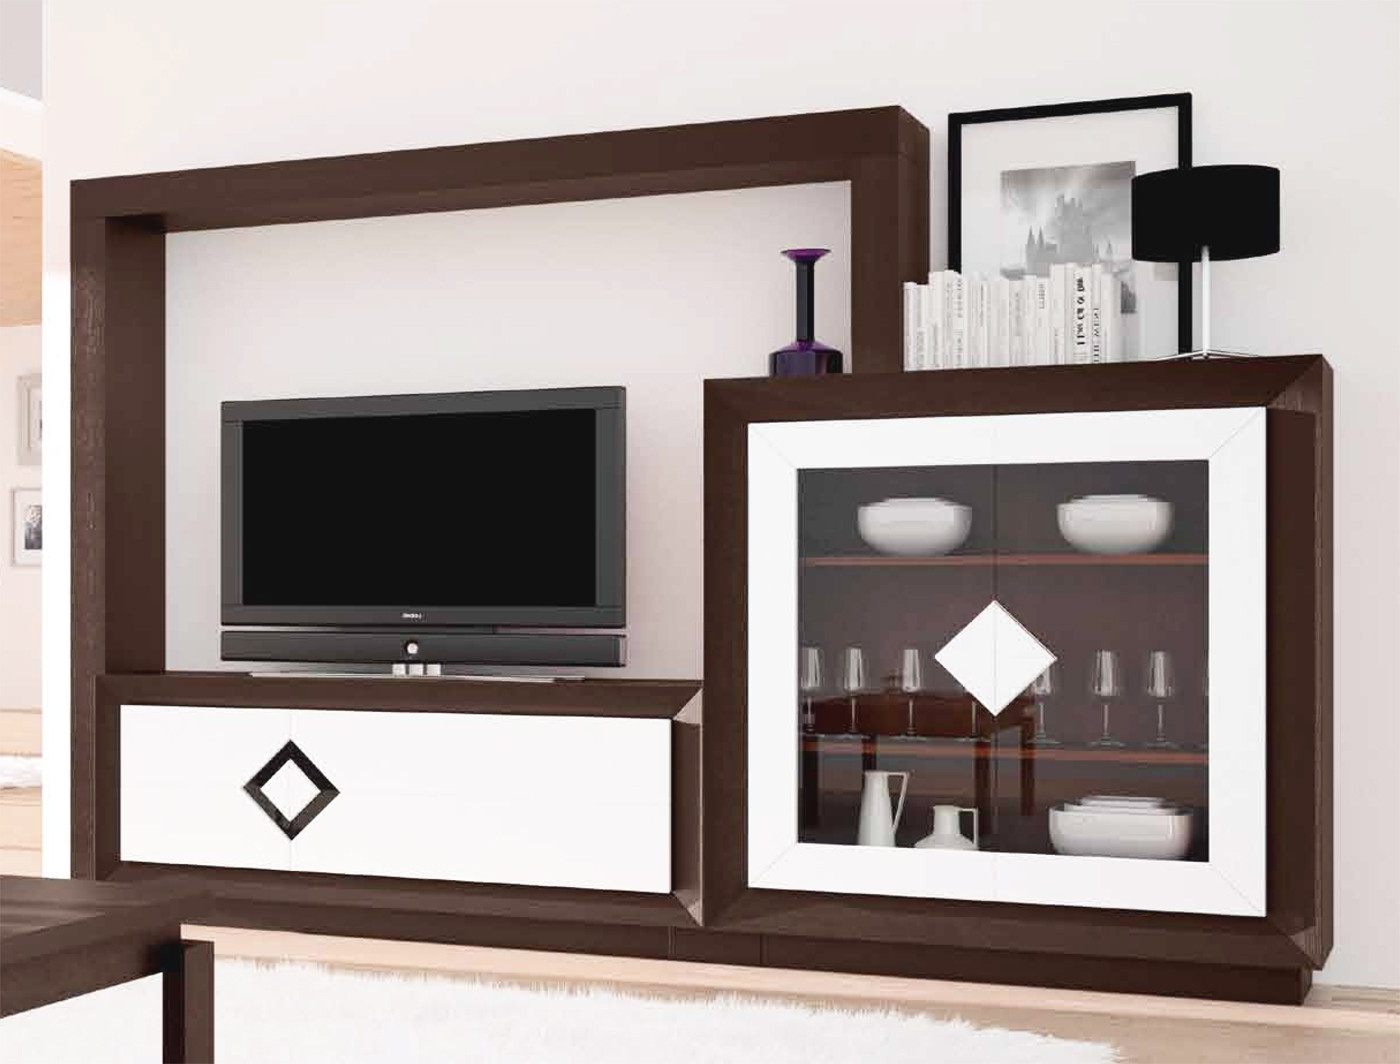 Conjunto Muebles Salon Budm Muebles Para Salà N Con Vitrina Vajillero Y Mueble Televisià N Madera